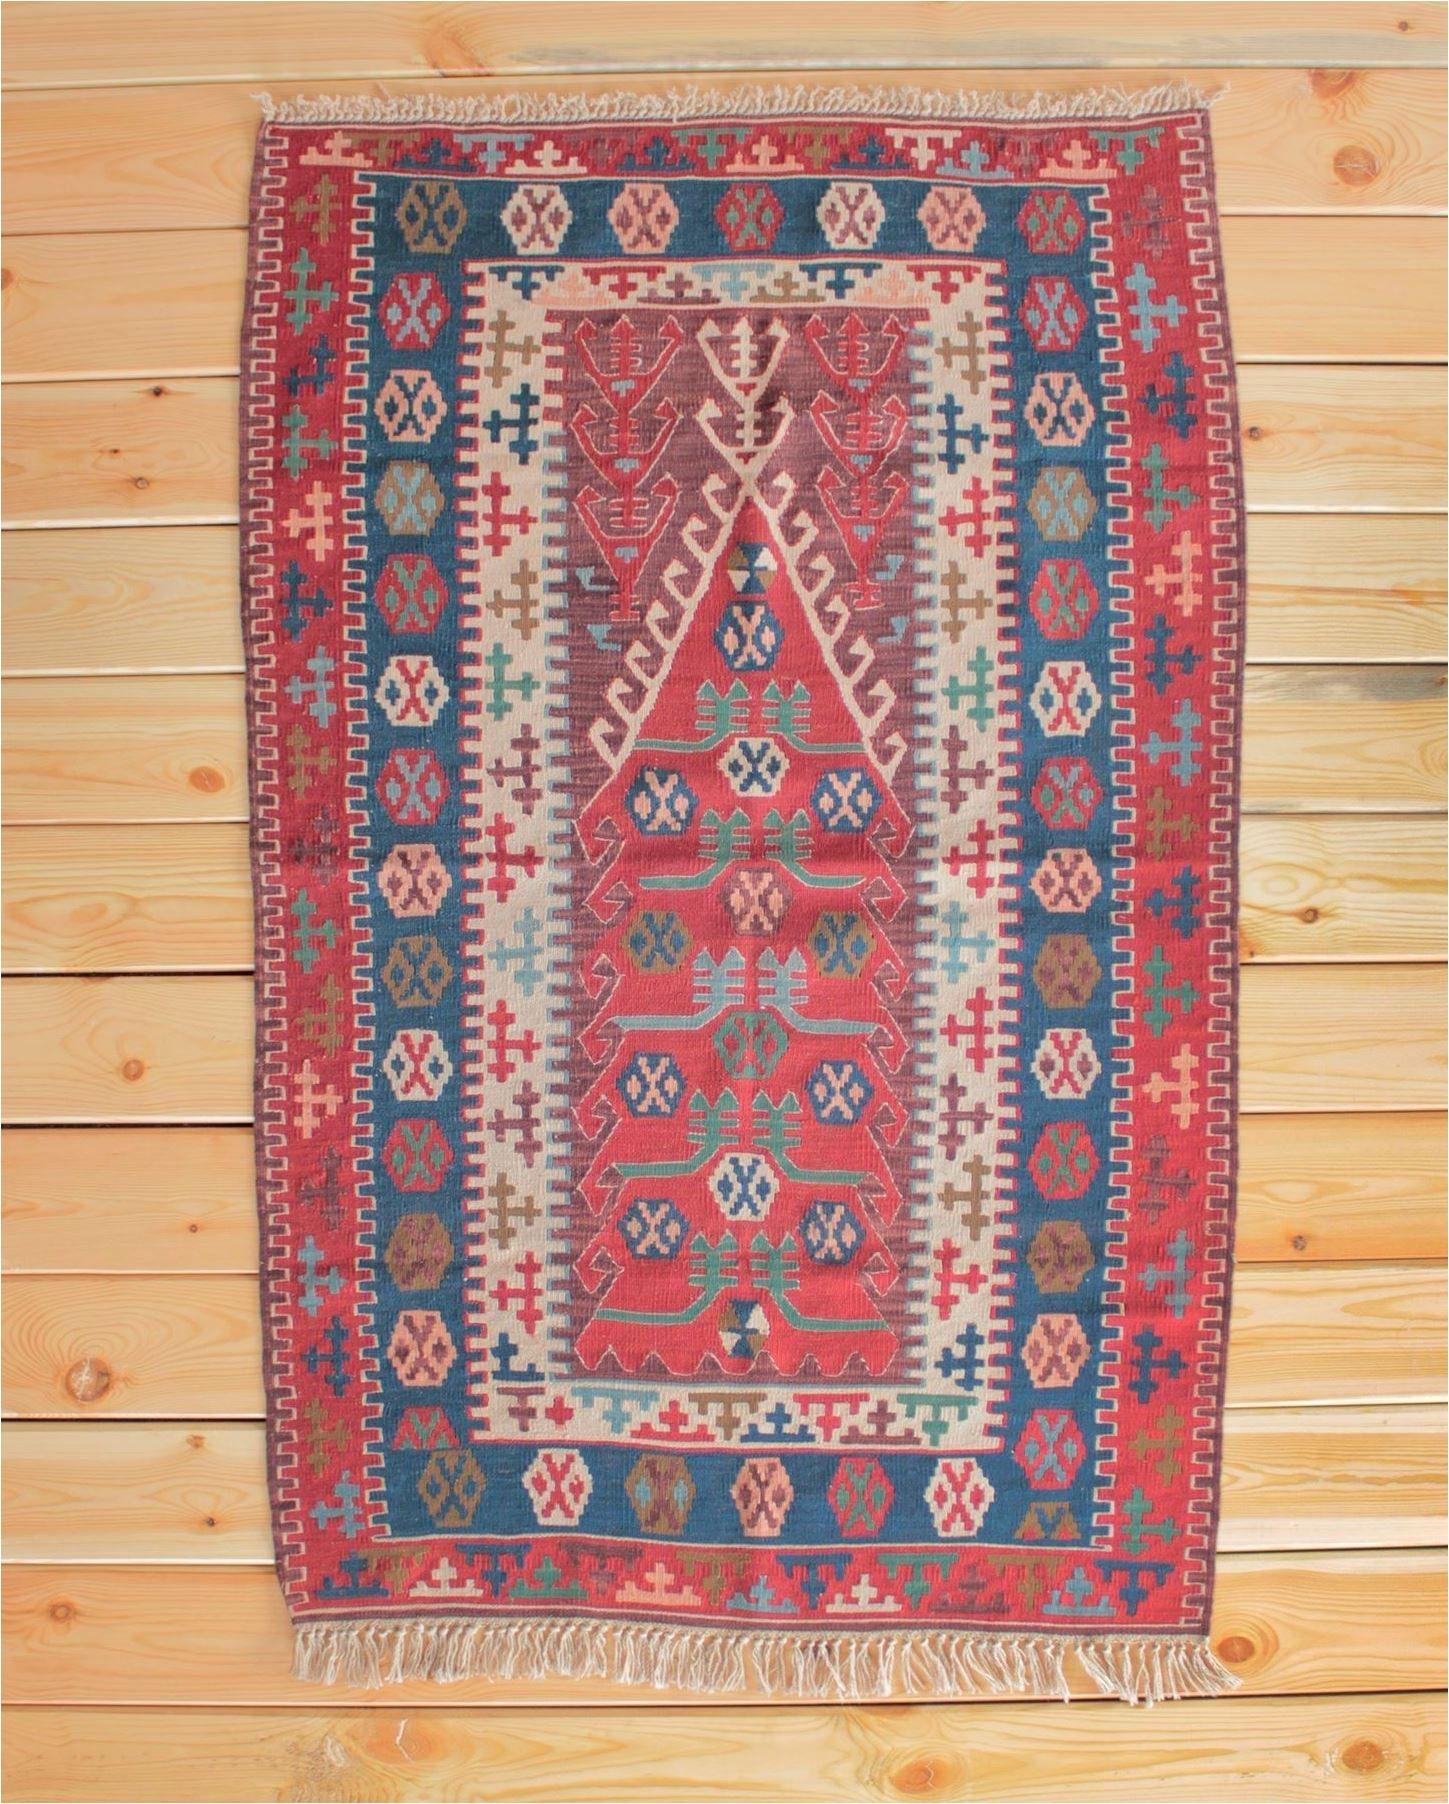 turkish rug turkish kilim rug 3 54 x 5 47 ft kilim ottoman area rug boho decor red rug home rug boho rug unique rug wool rug red kilim rug